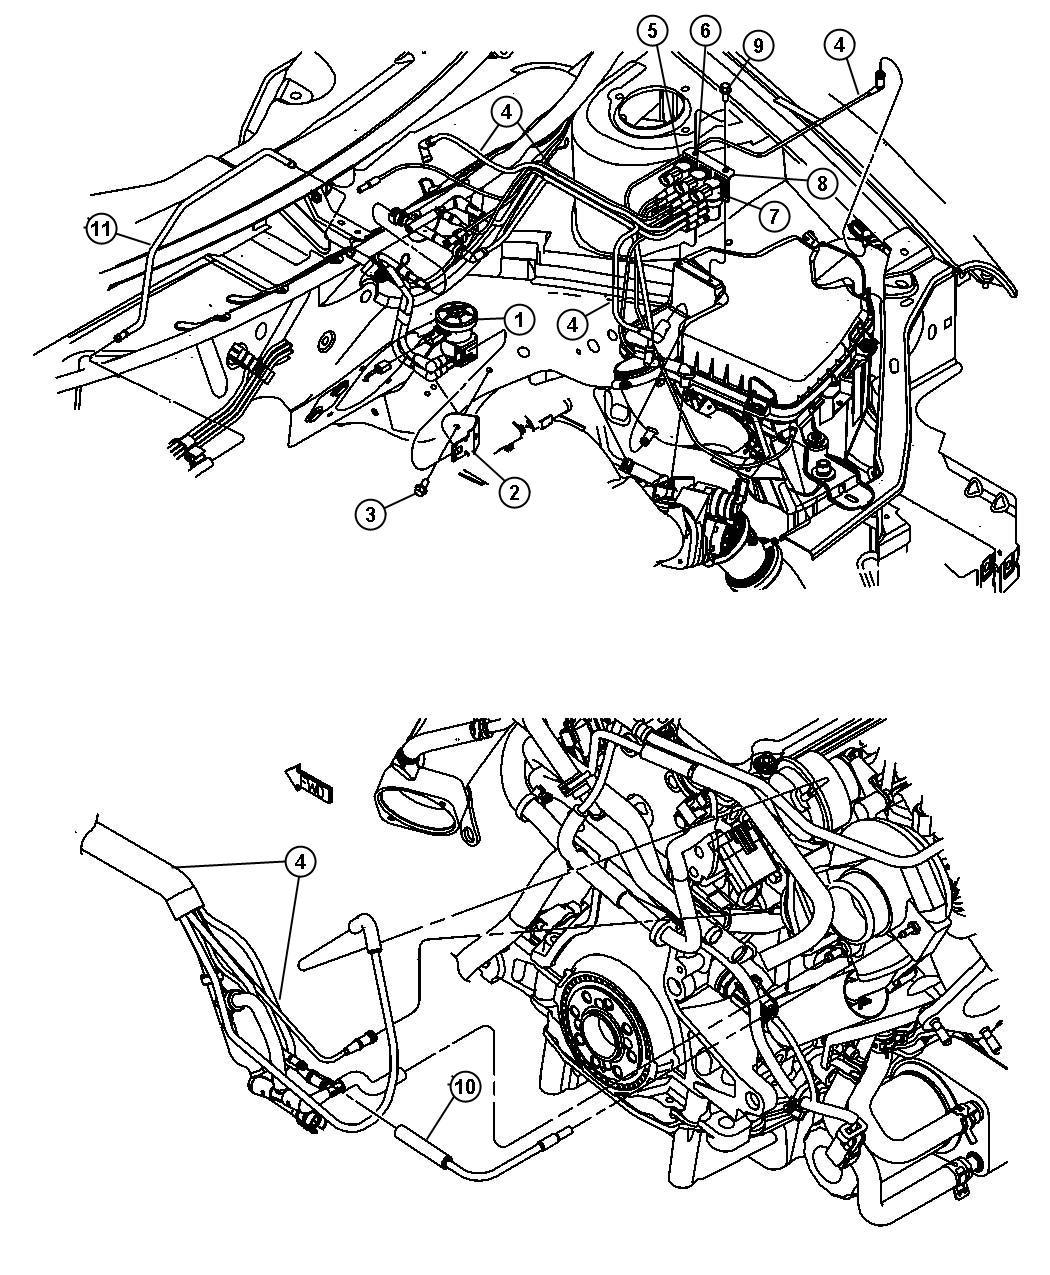 Vr6 Engine Diagram